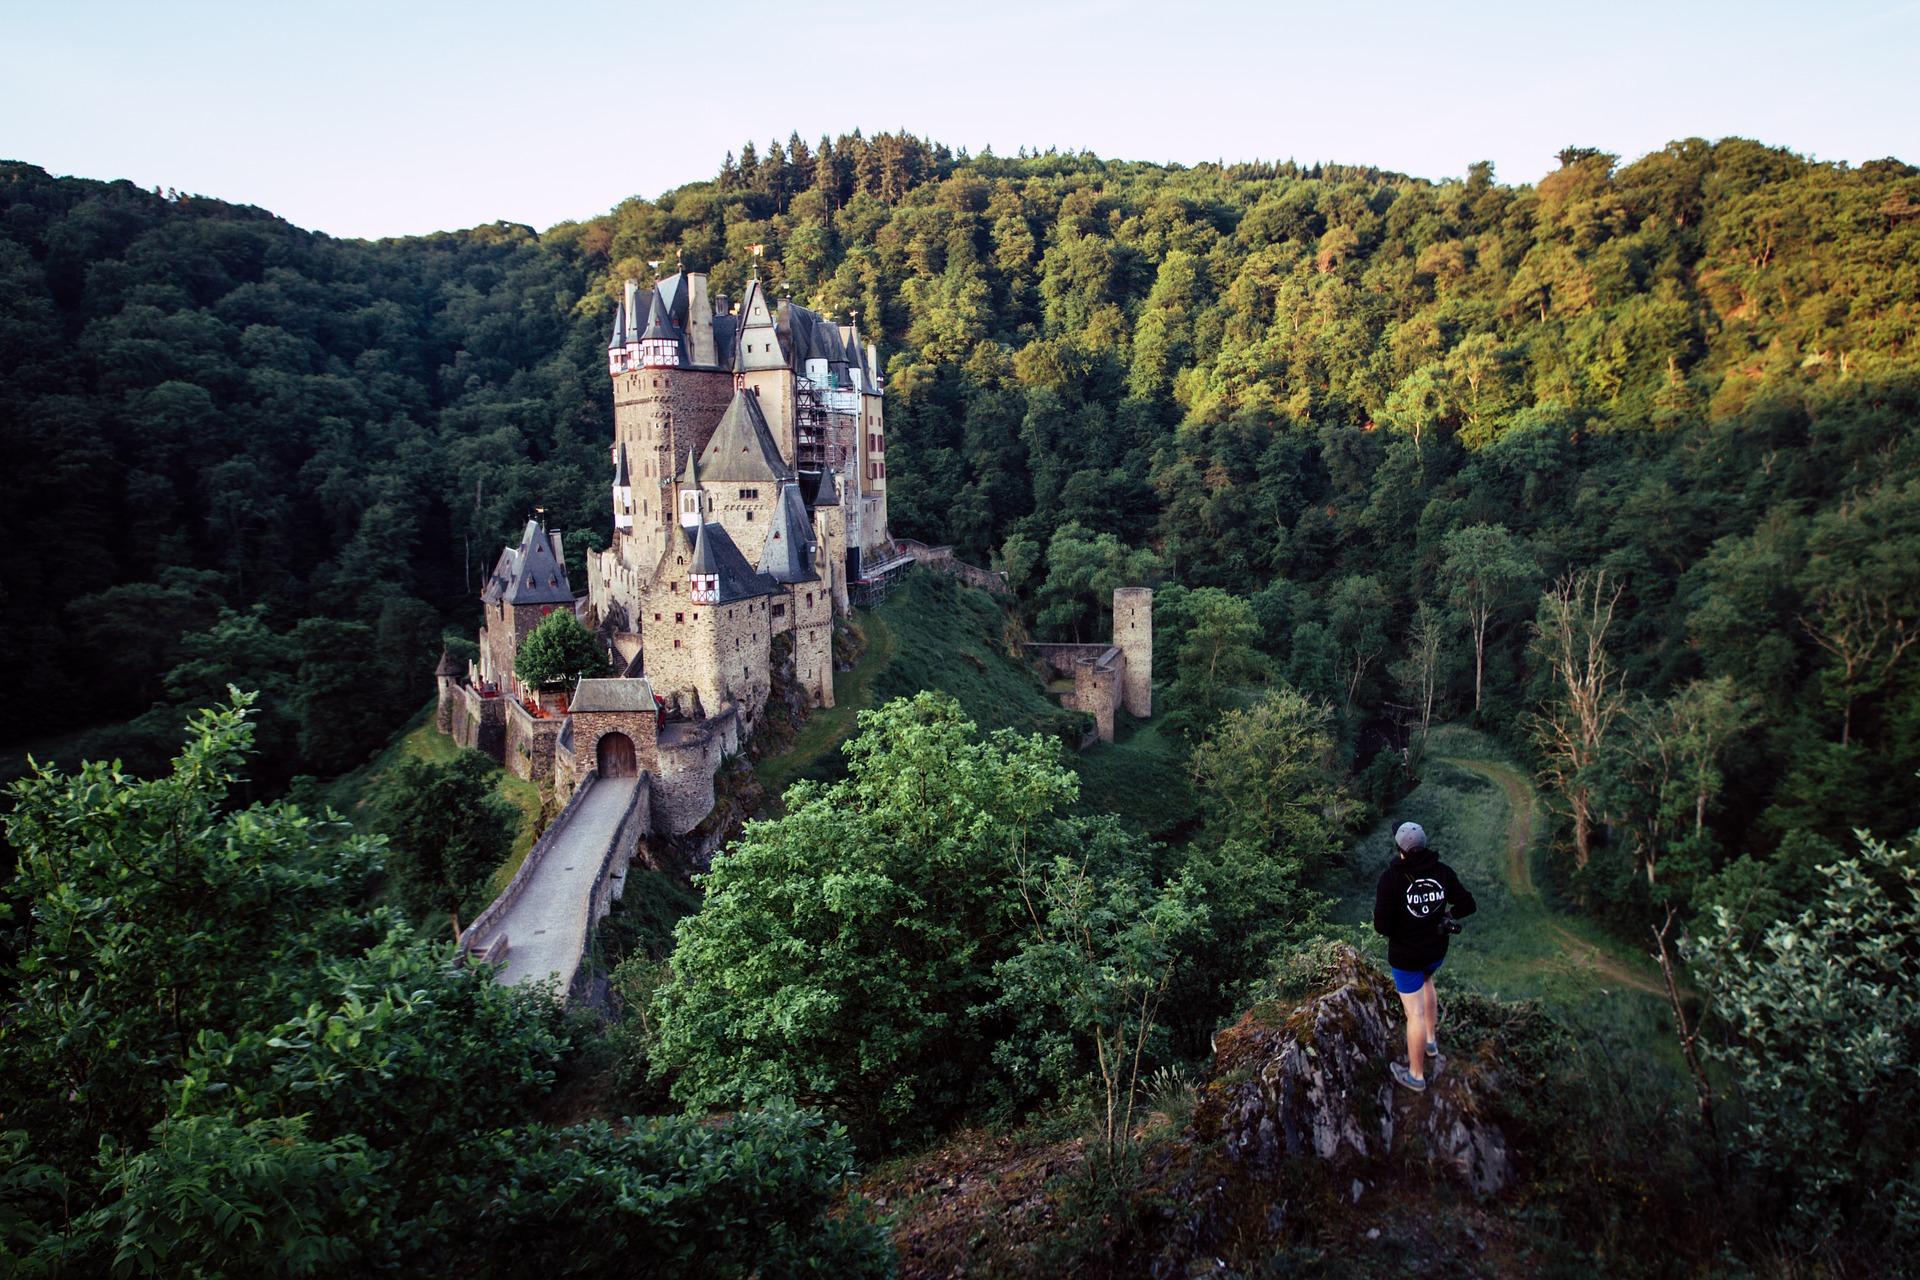 castle-2351417_1920.jpg